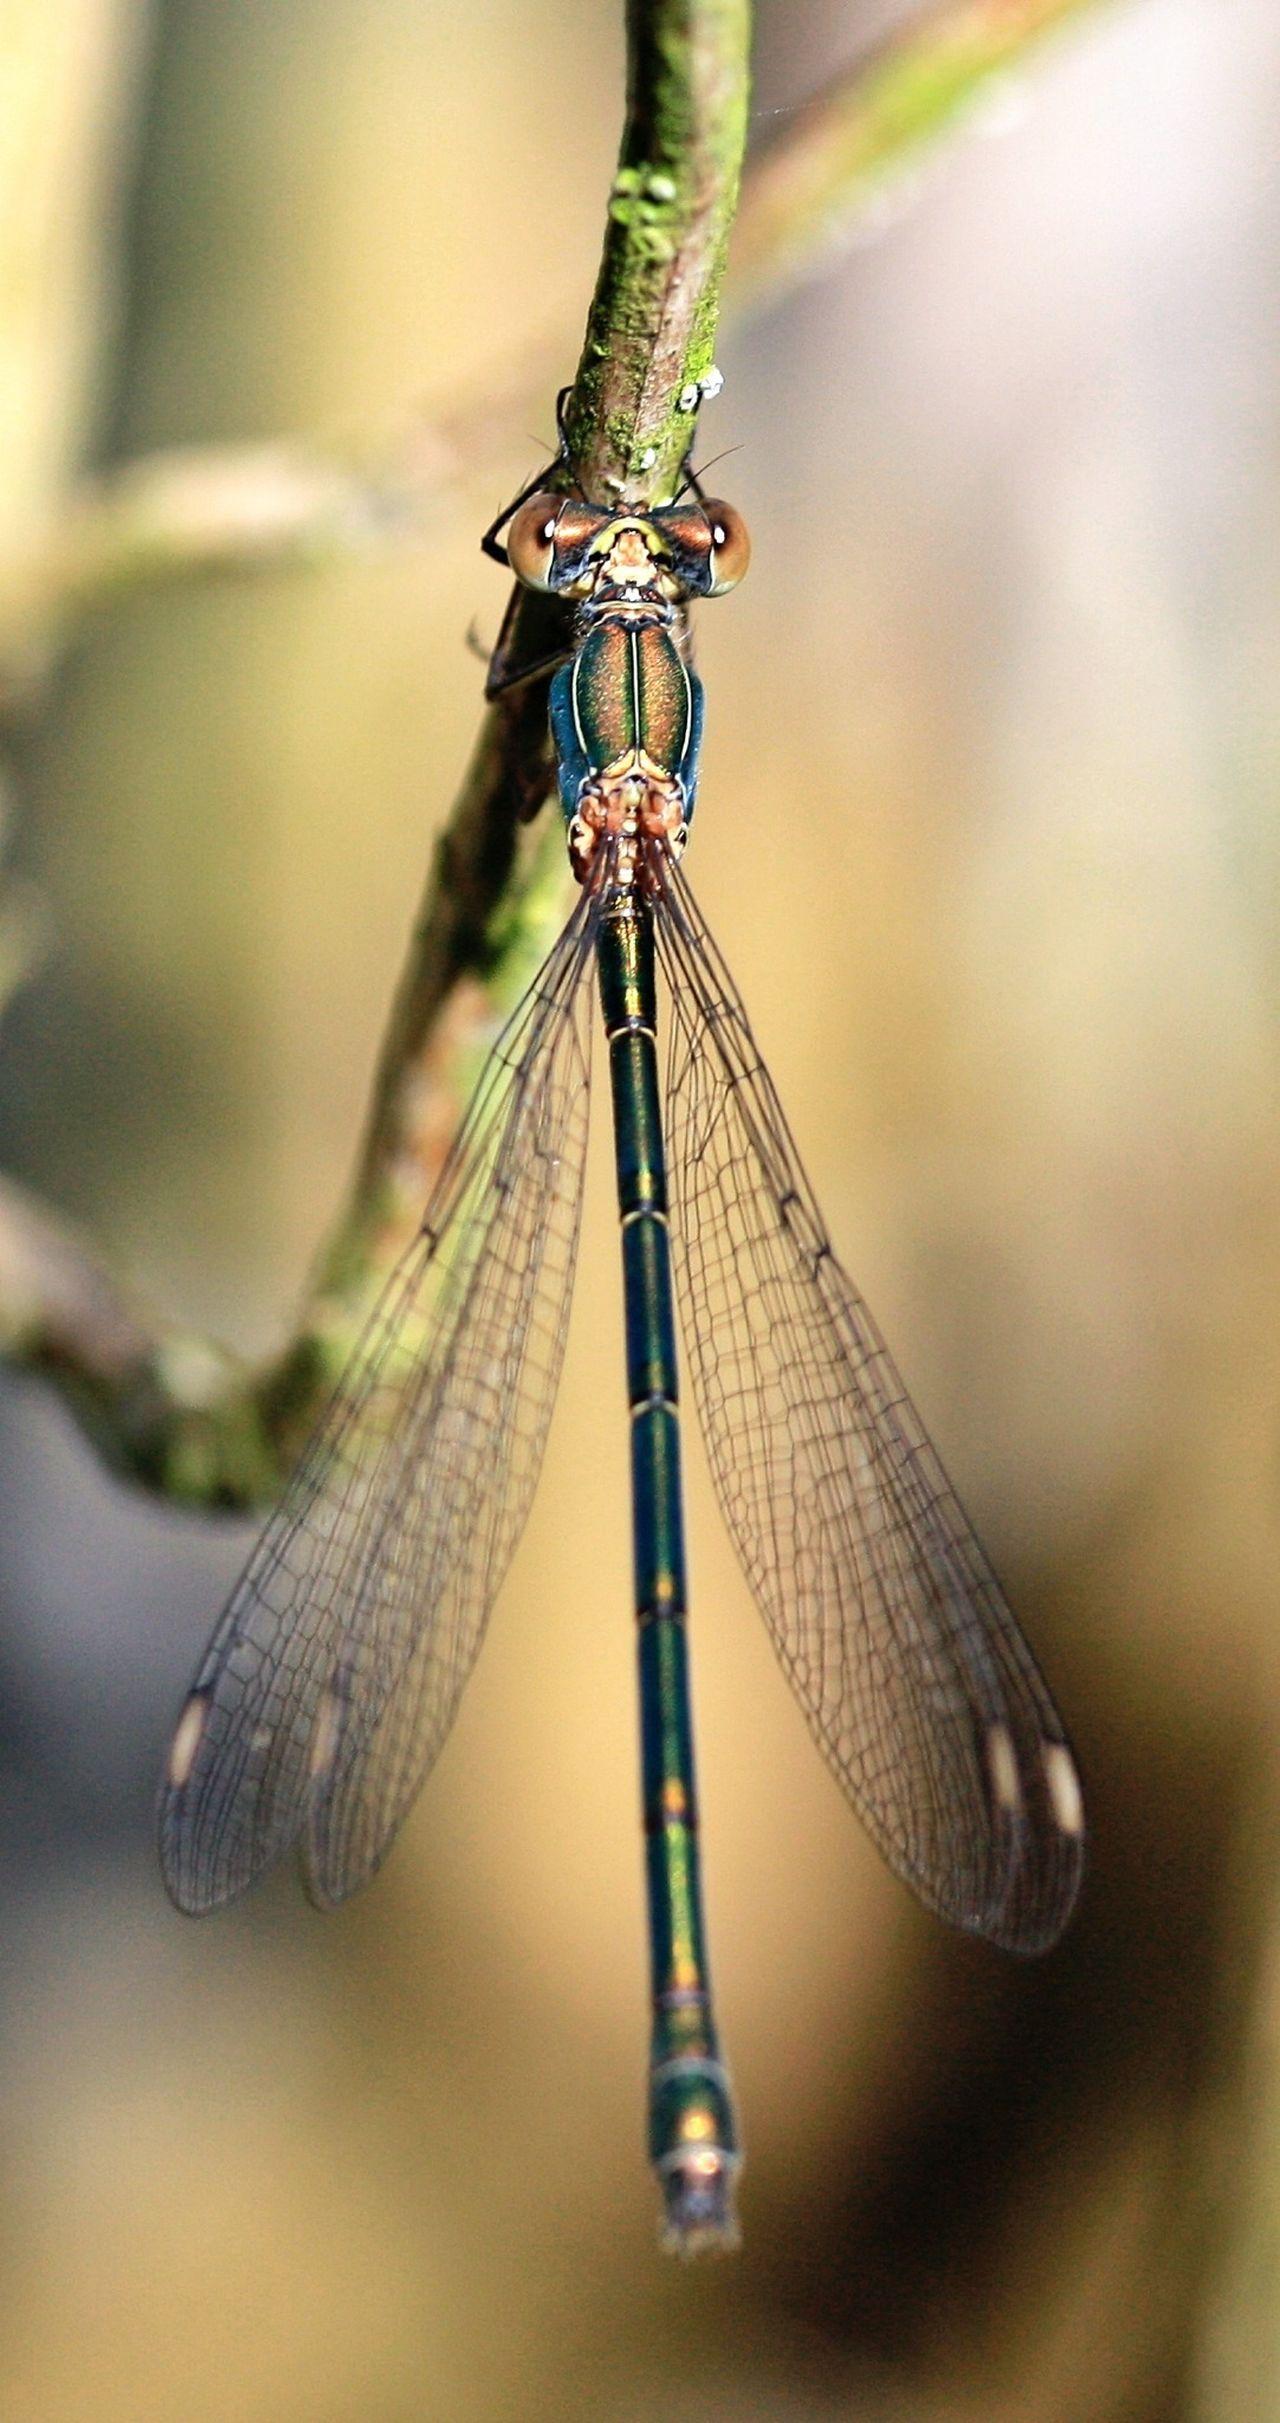 Dragonfly Libelle In My Garden